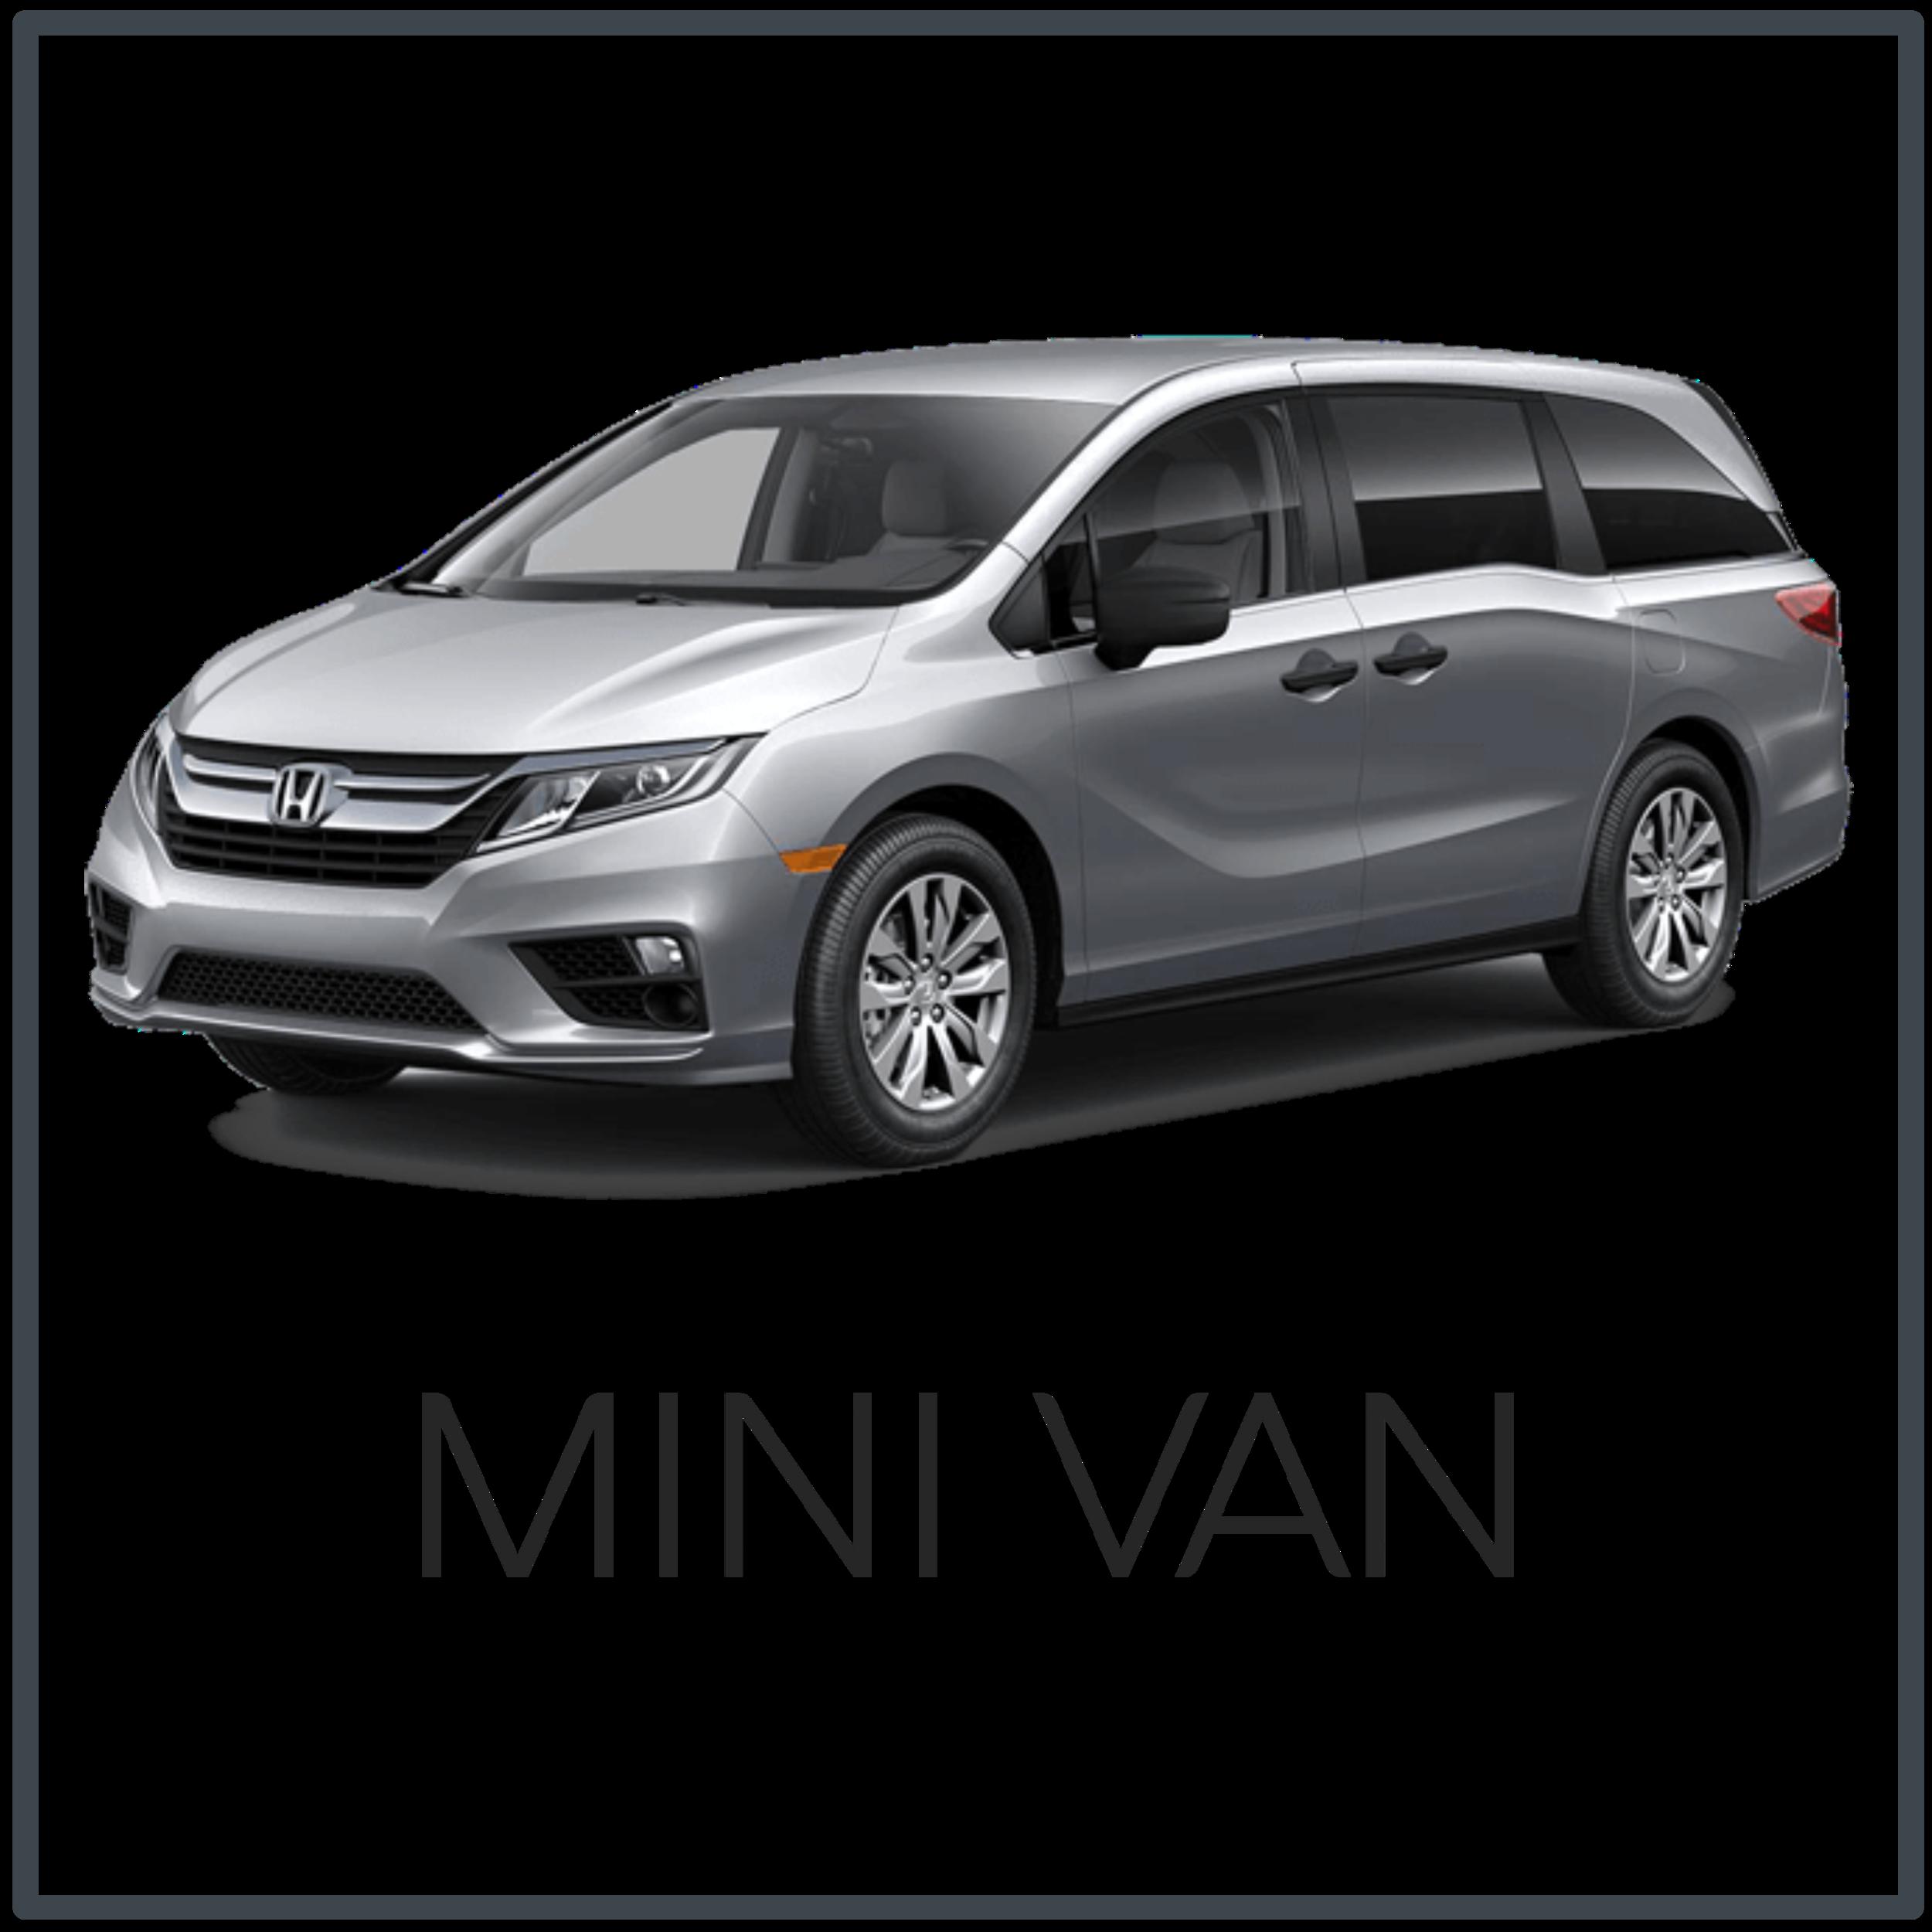 mini van.png